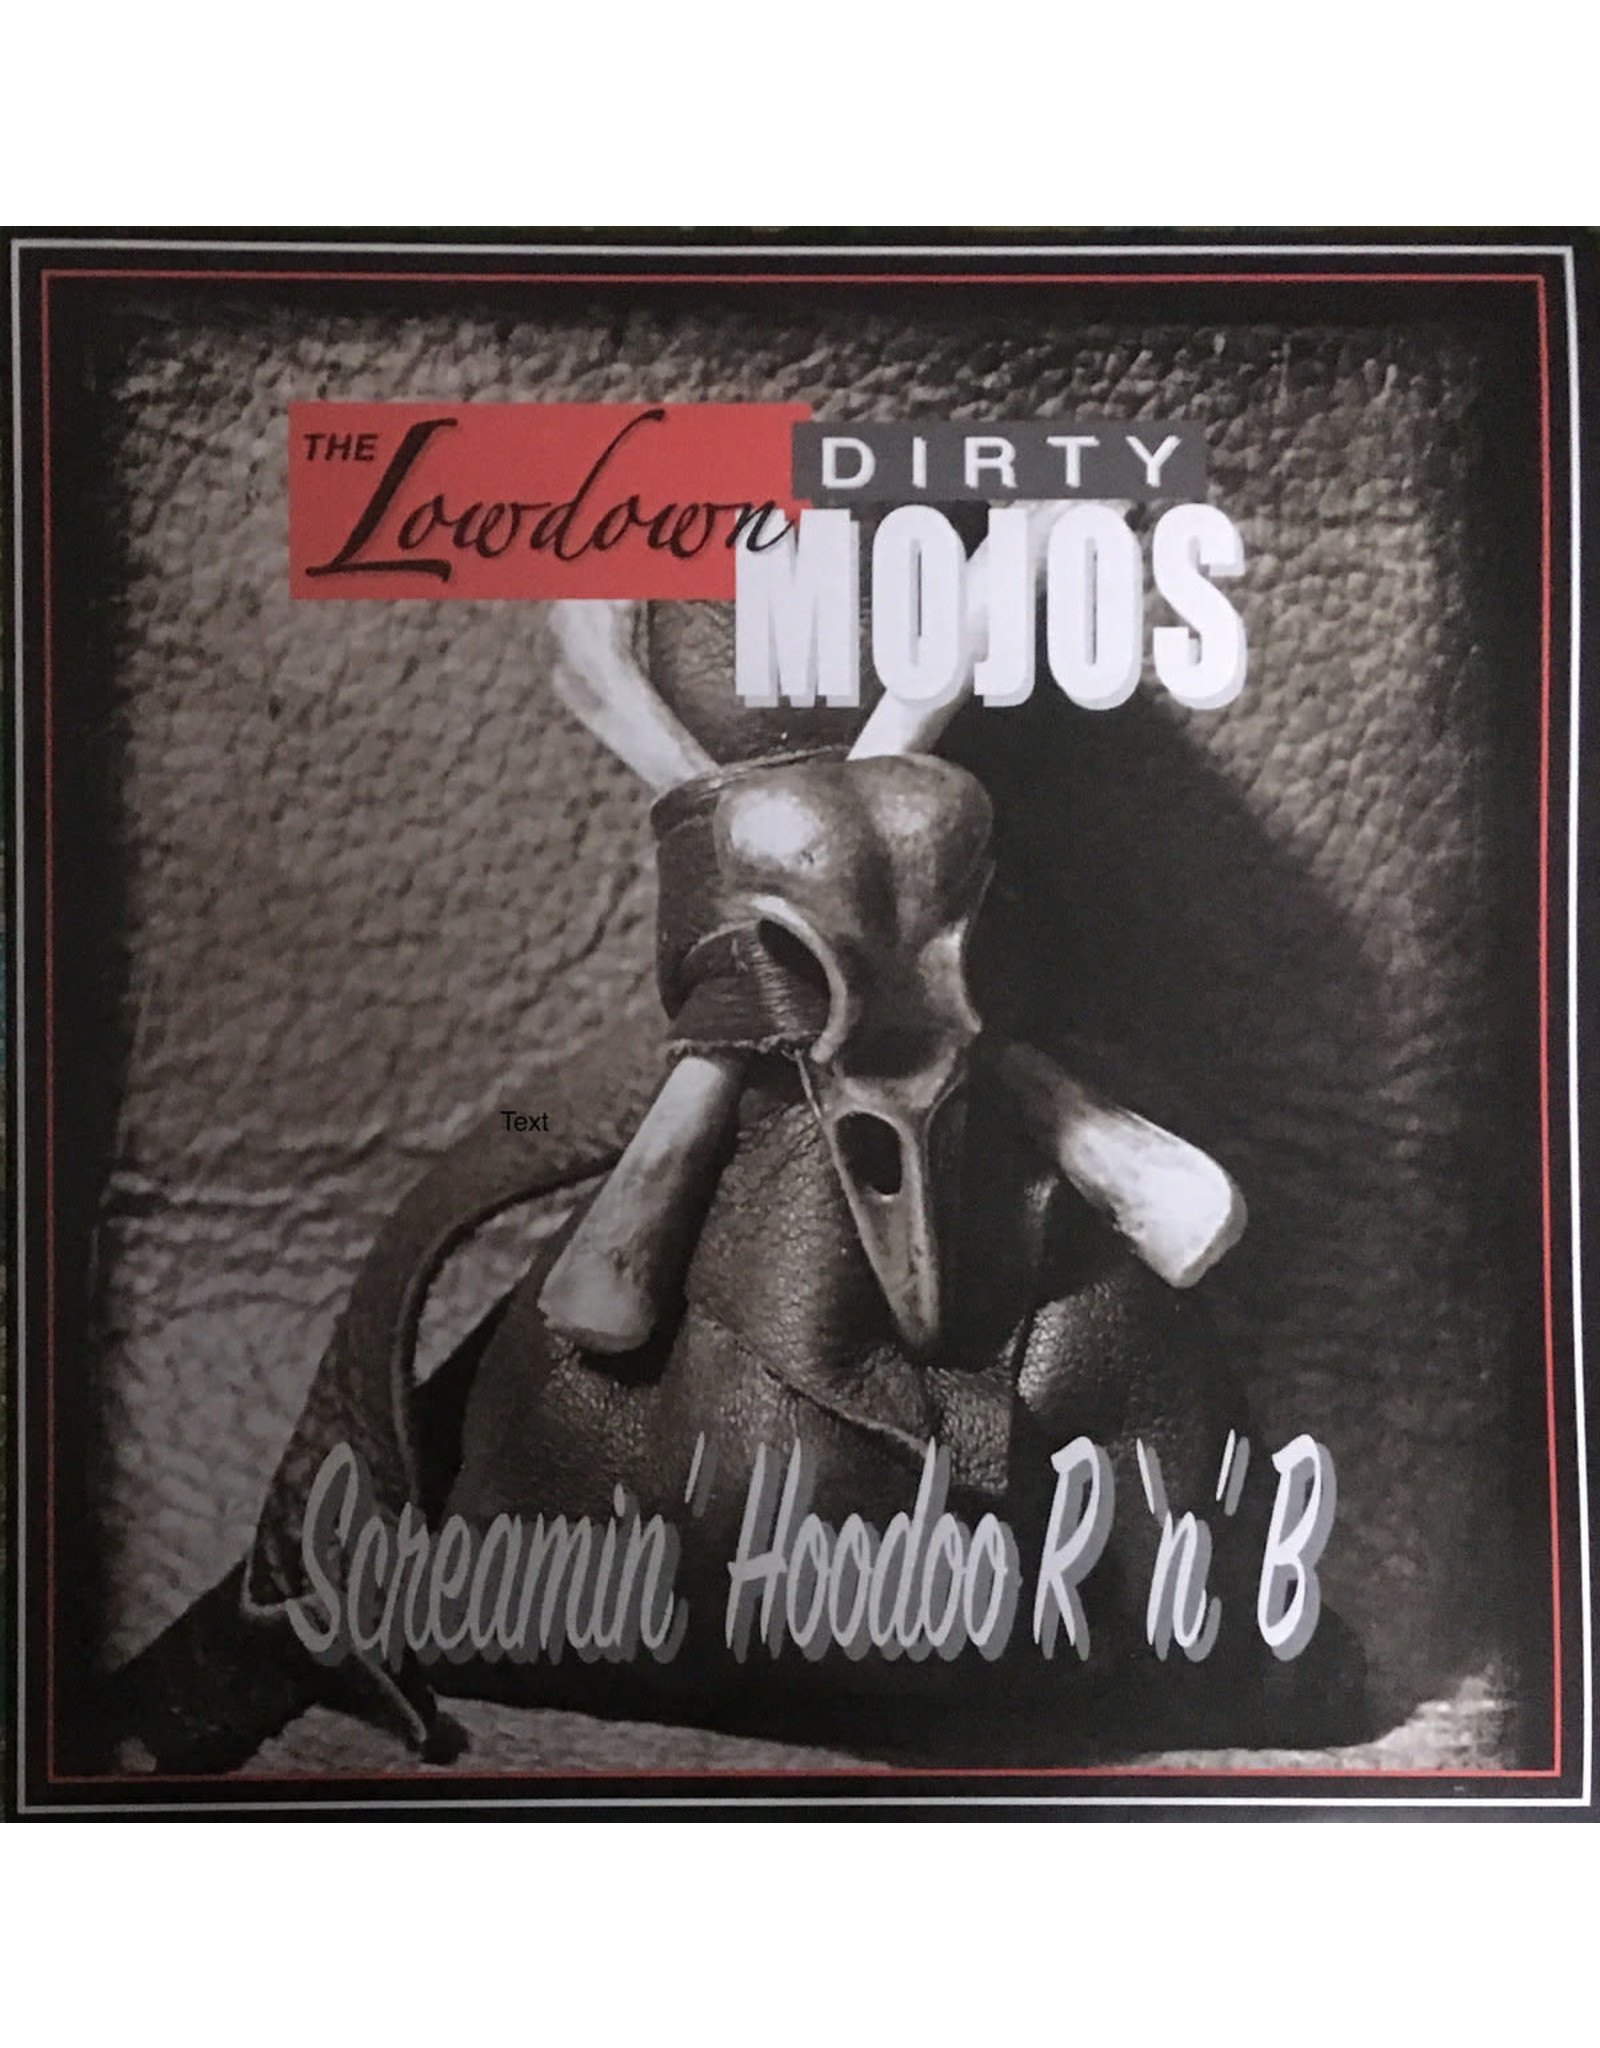 Lowdown Dirty Mojos, The - Screamin' Hoodoo R 'n' B LP